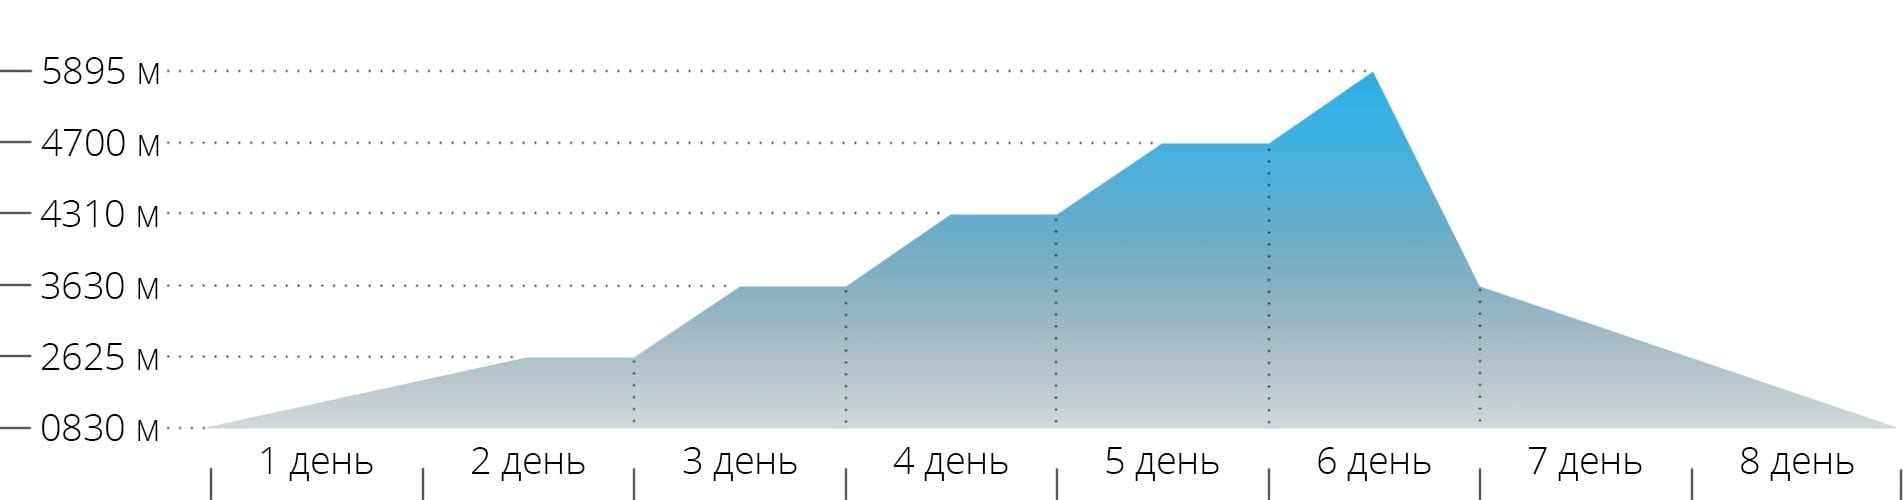 Акклиматизационный график для маршрута Ронгаи на Килиманджаро